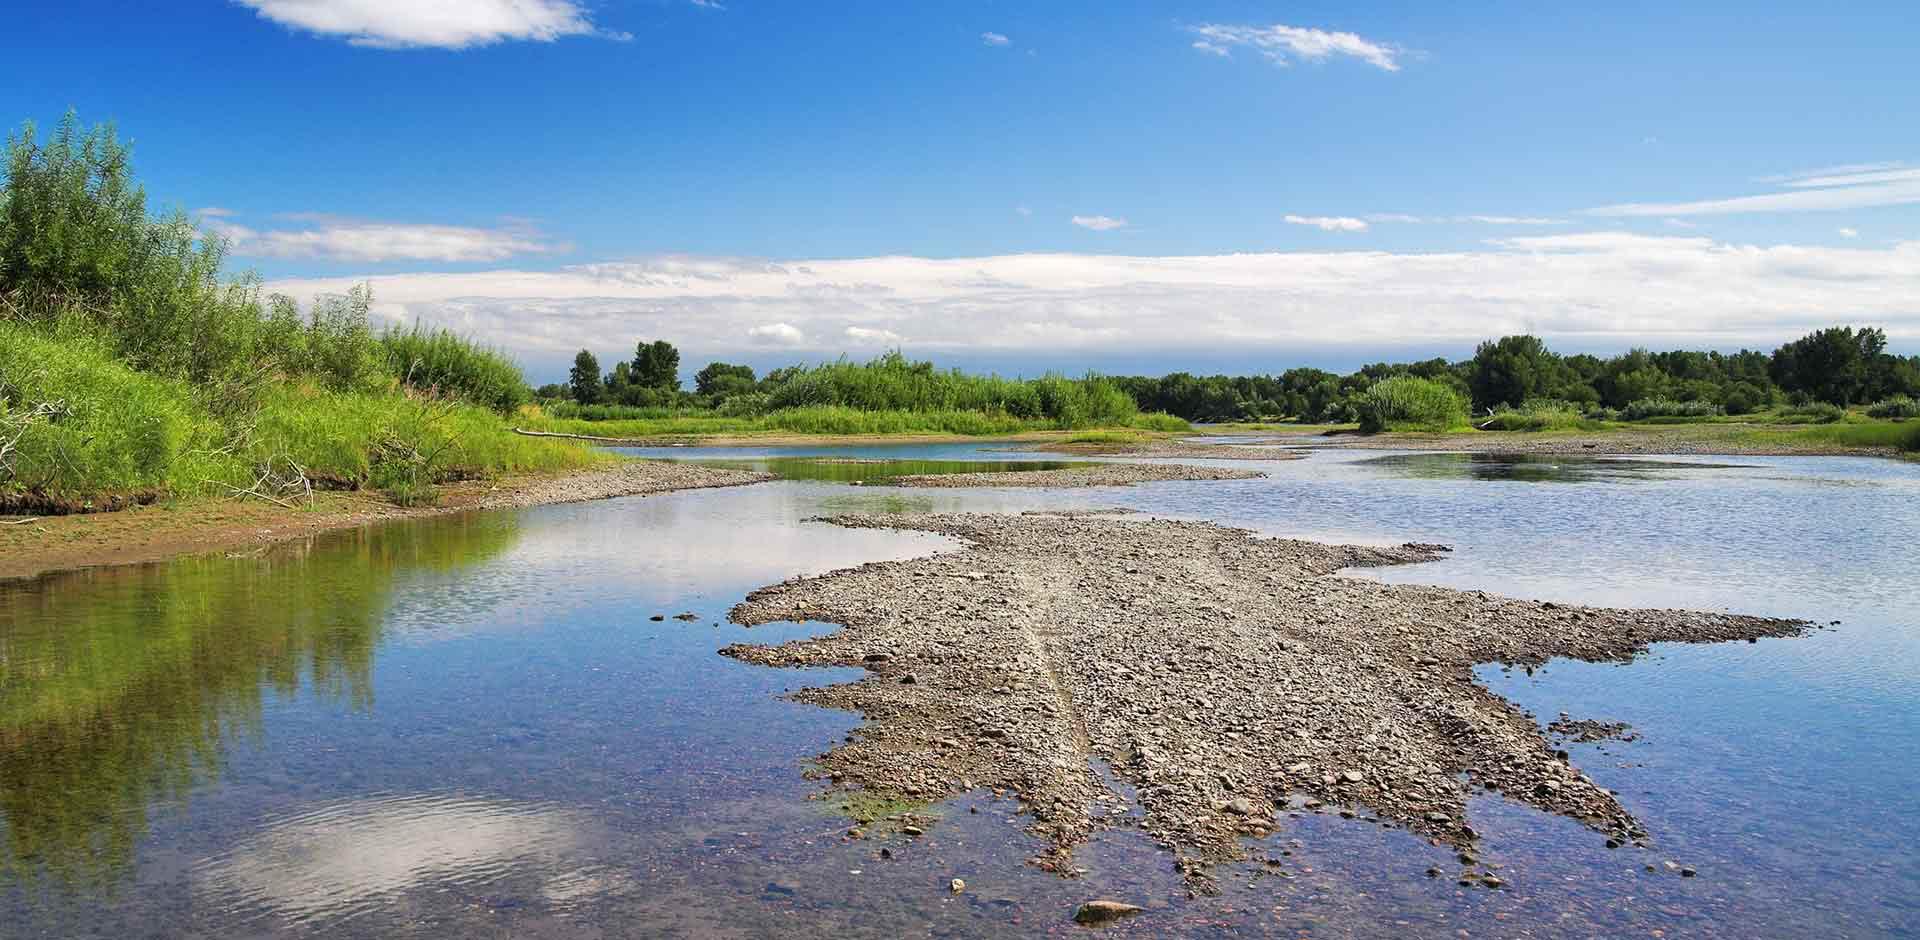 Siberian Civilizations Tuva Khakassia Luxury Siberia Itinerary Remote Lands